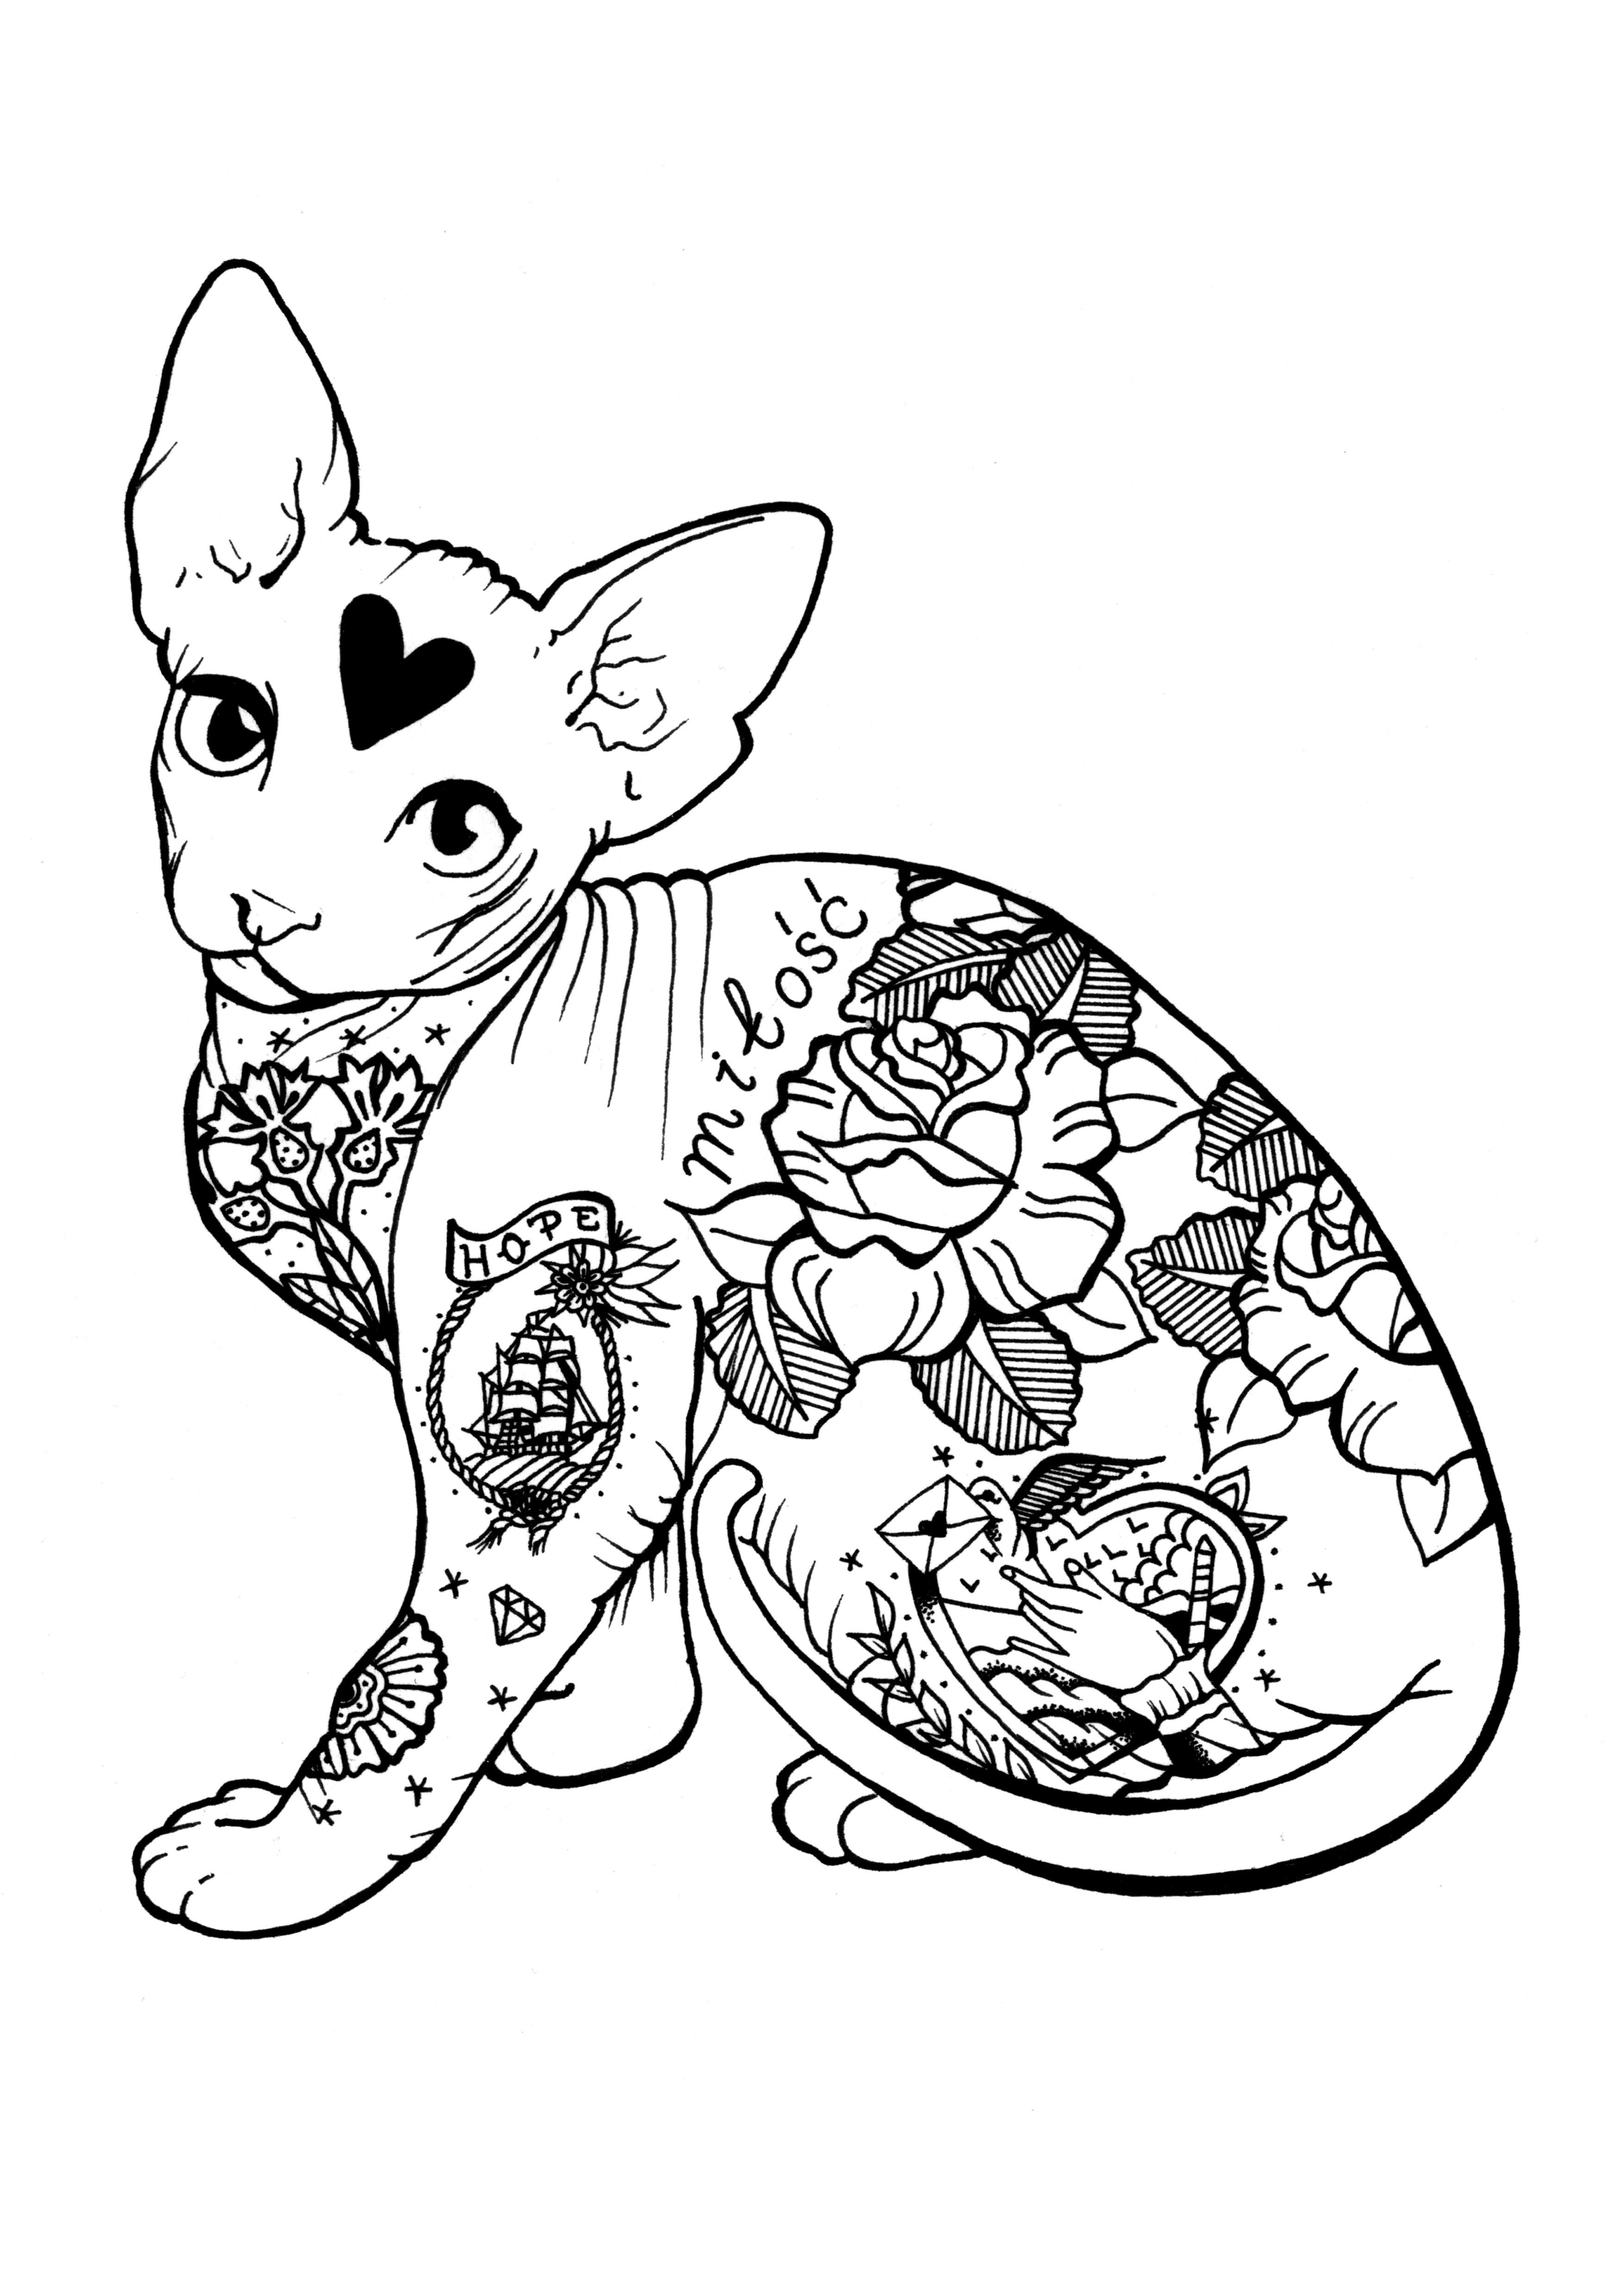 Sphynx Cat by N.L.